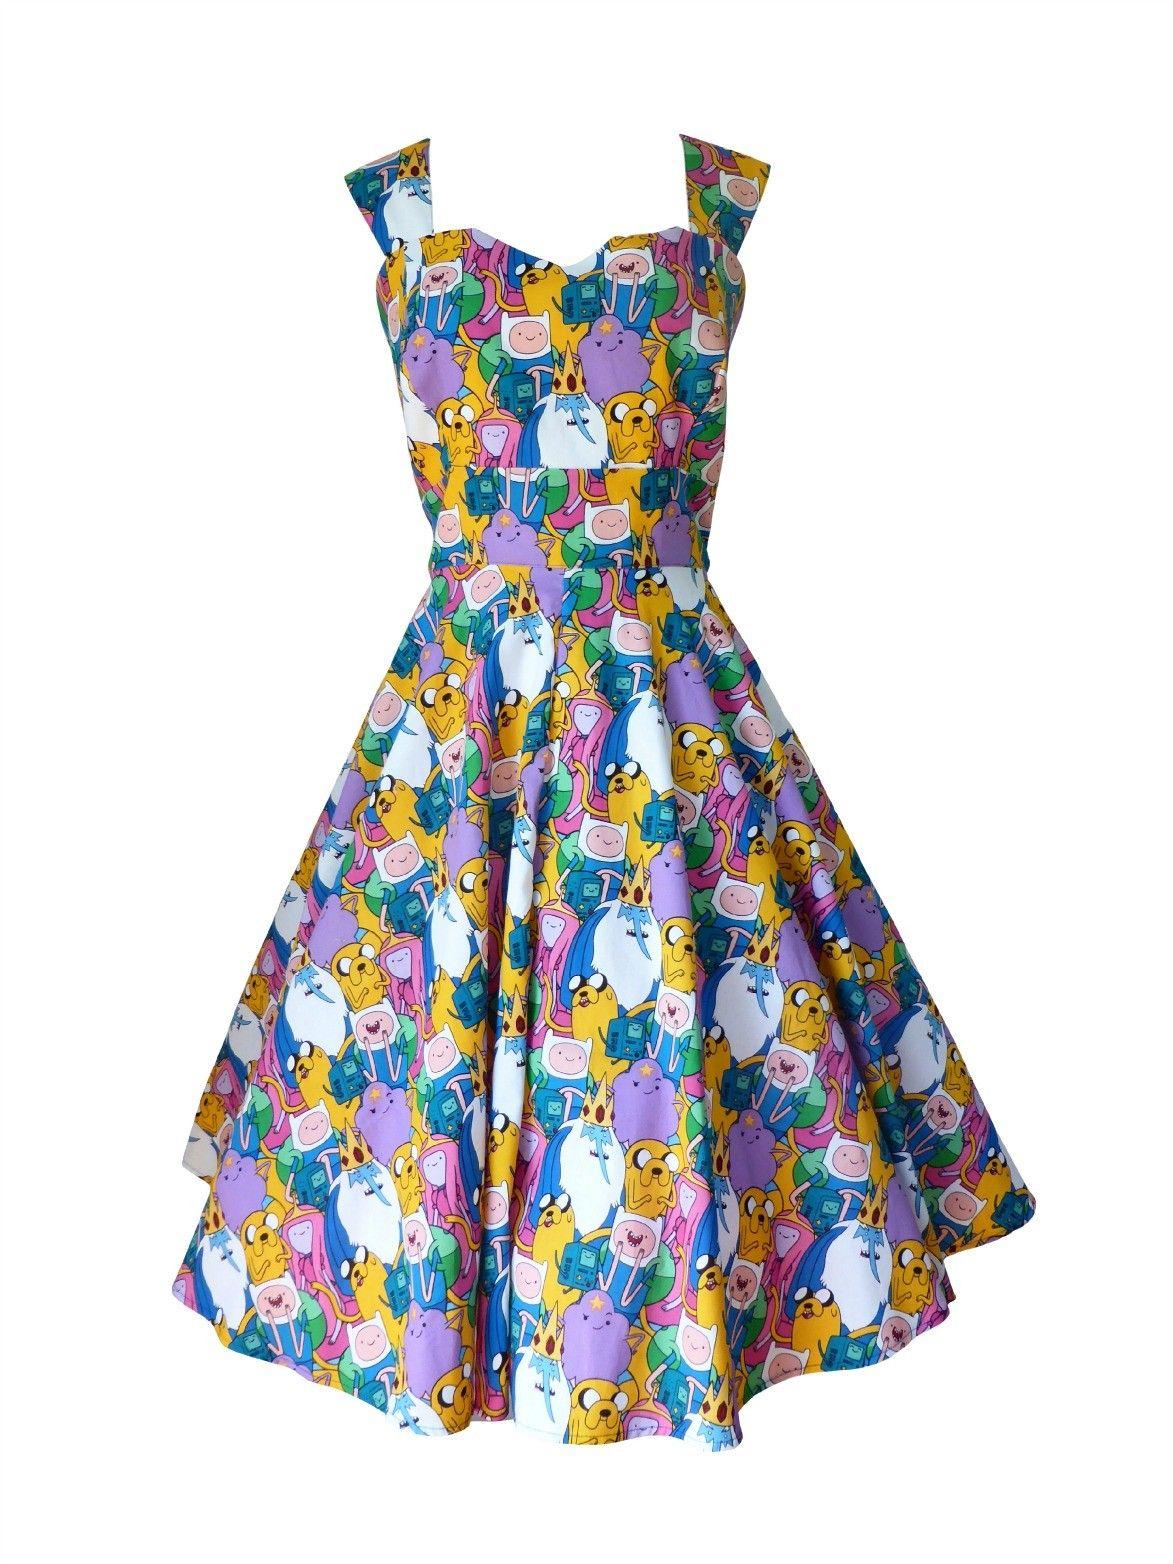 adventure time dress perfect swing dress my style dresses